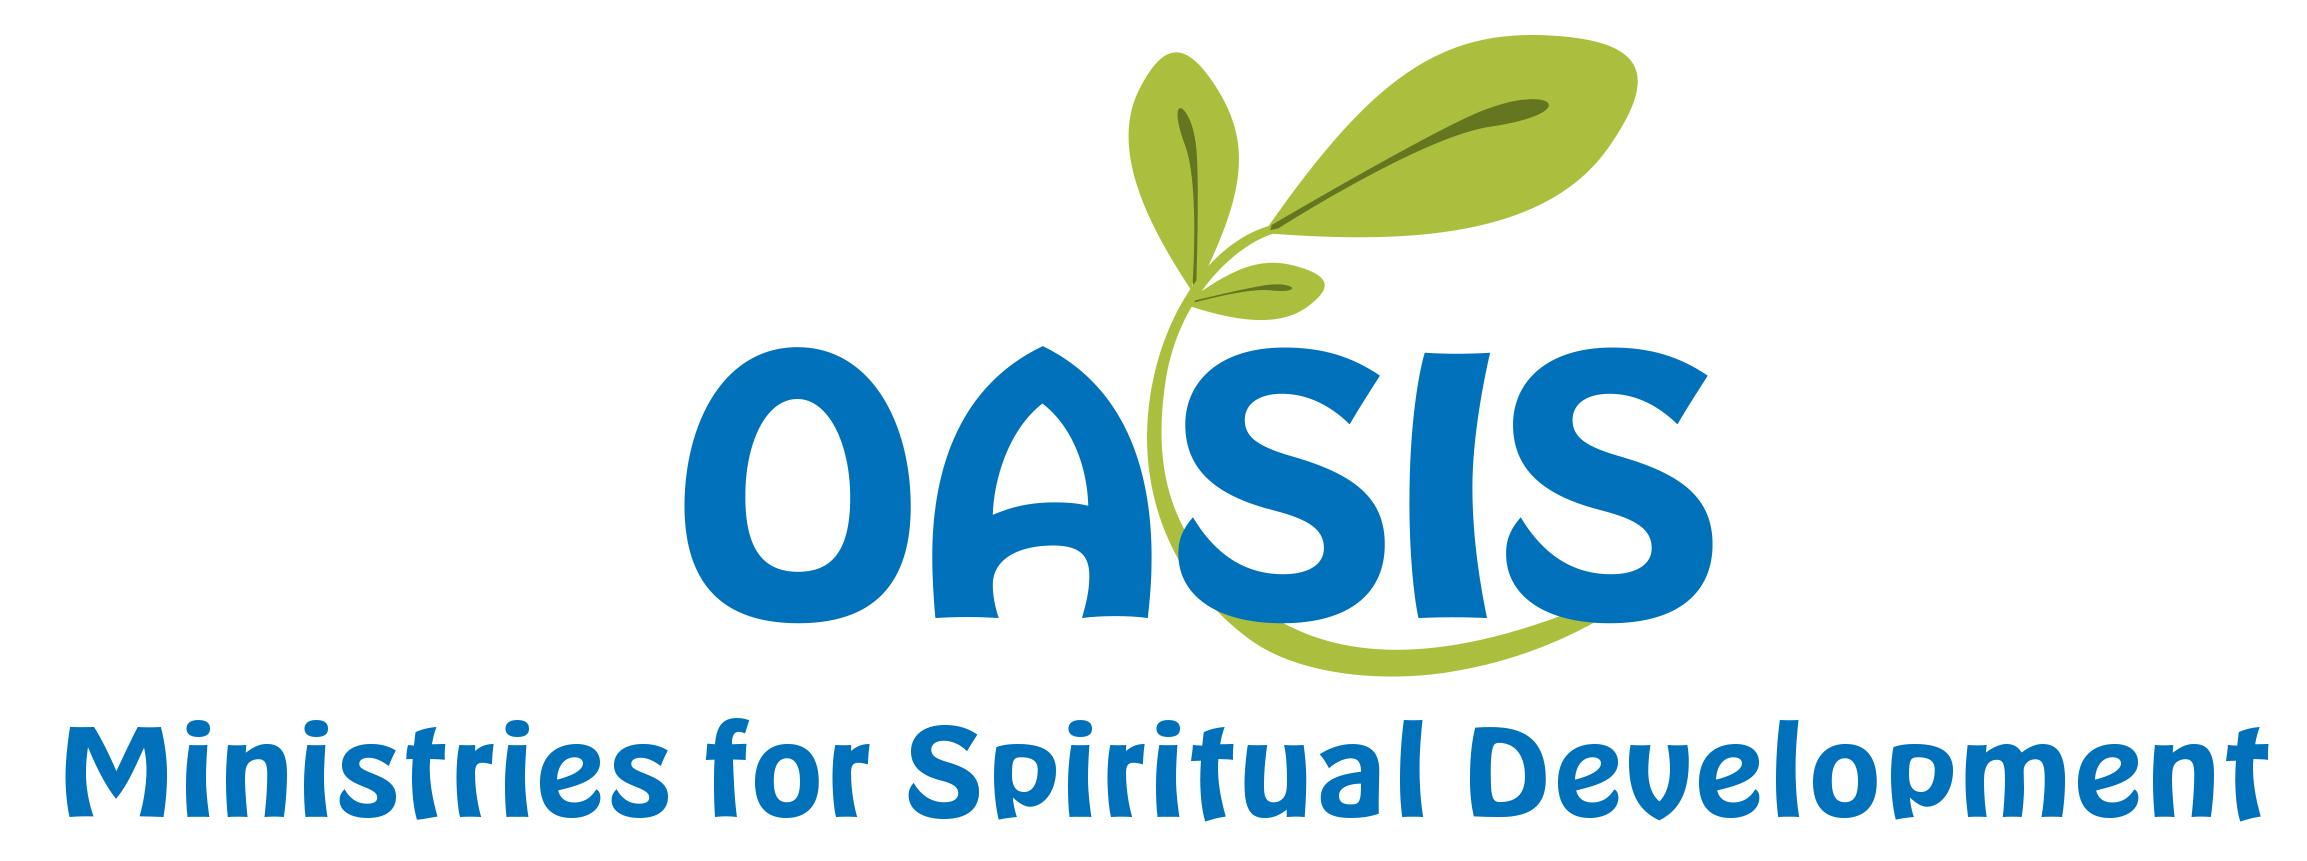 OASIS Ministries for Spiritual Develpment